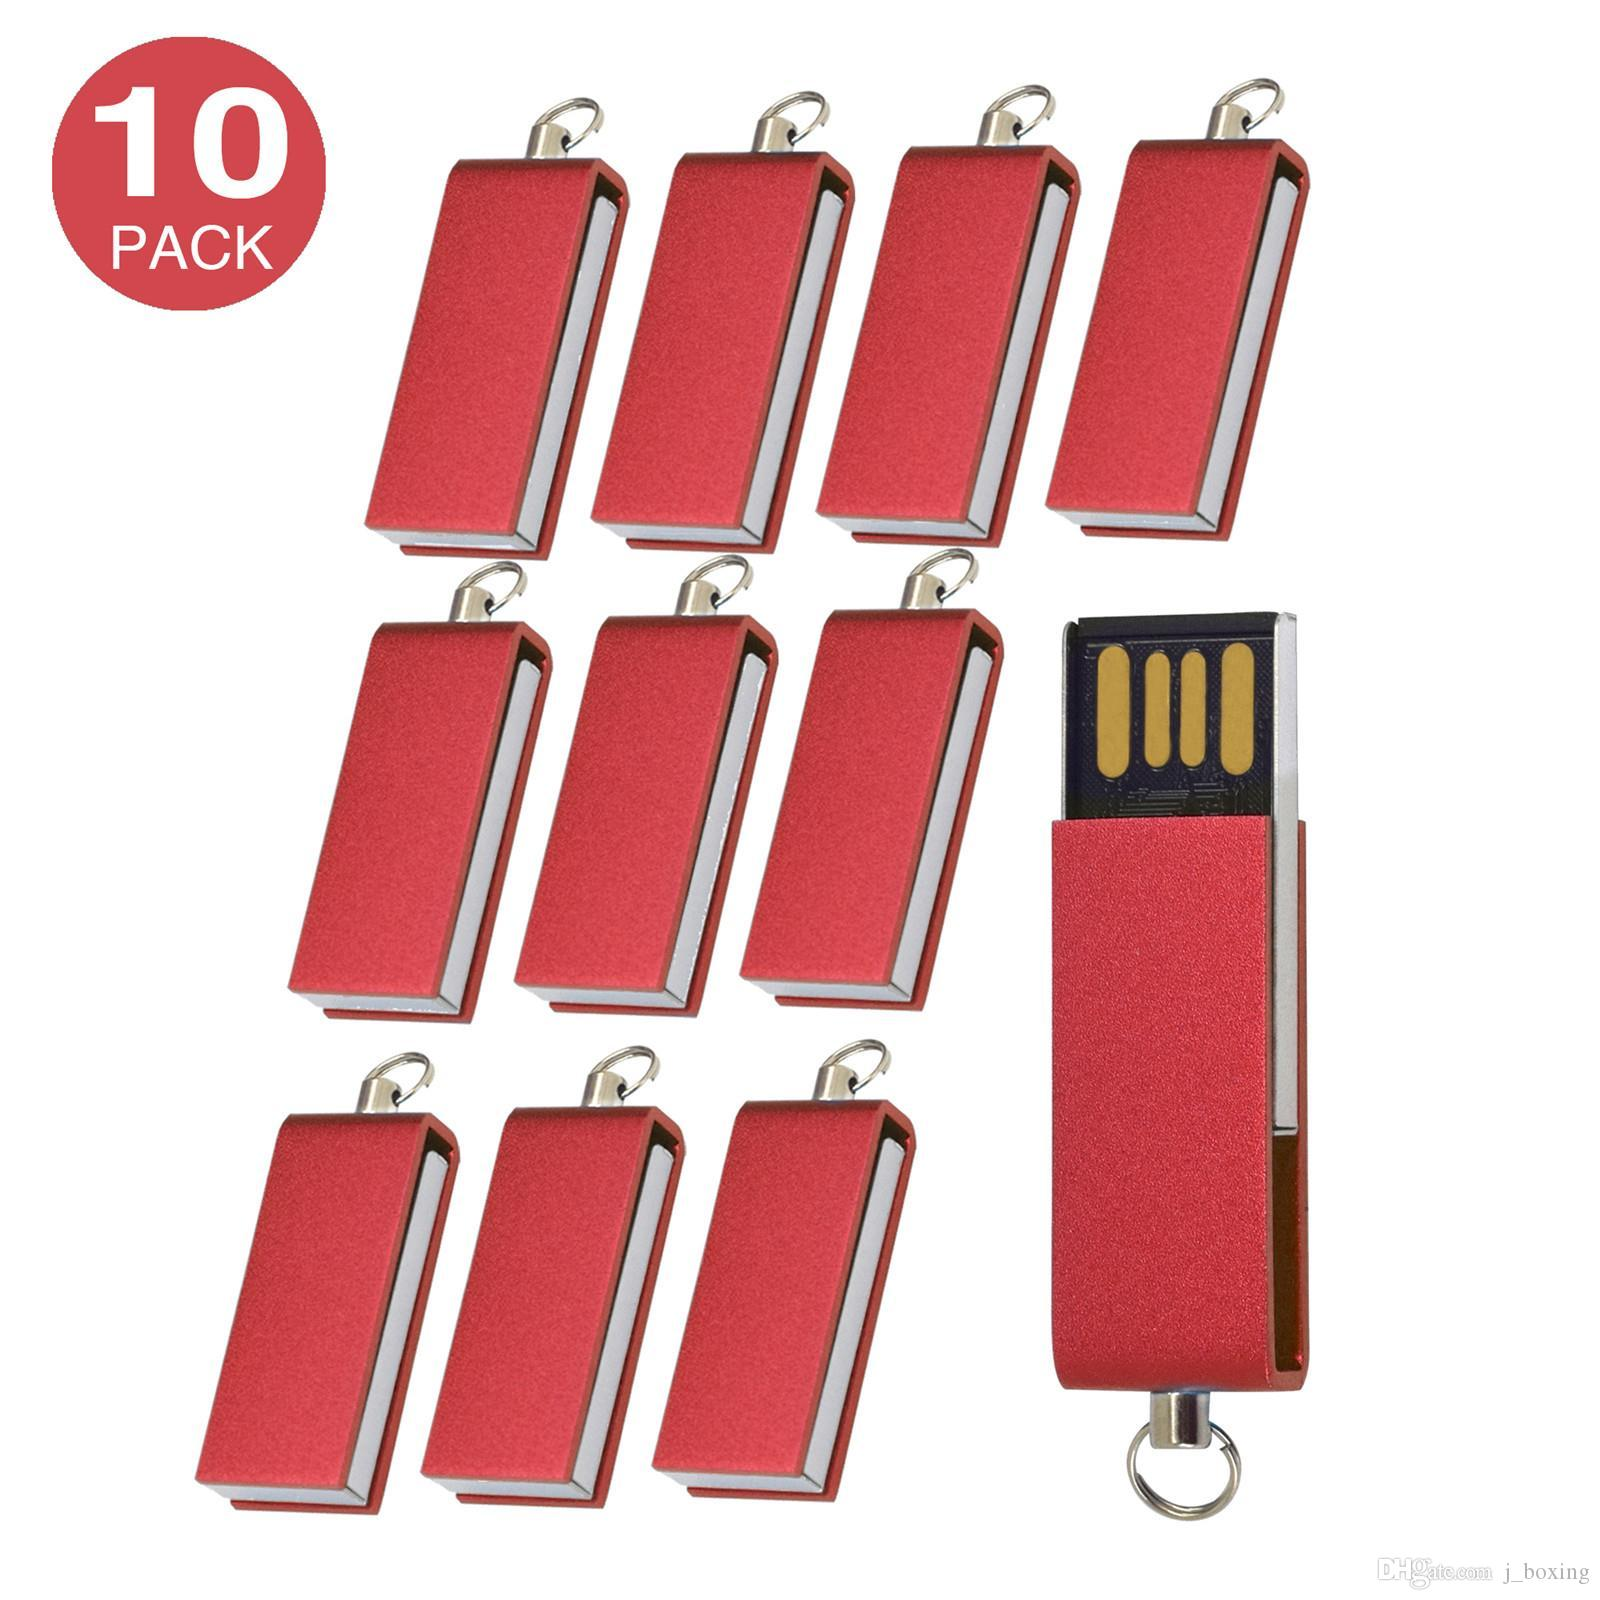 10x  8GB USB Flash Drive Pen Drives Thumb Drives USB2.0 Sticks Bulk Lot